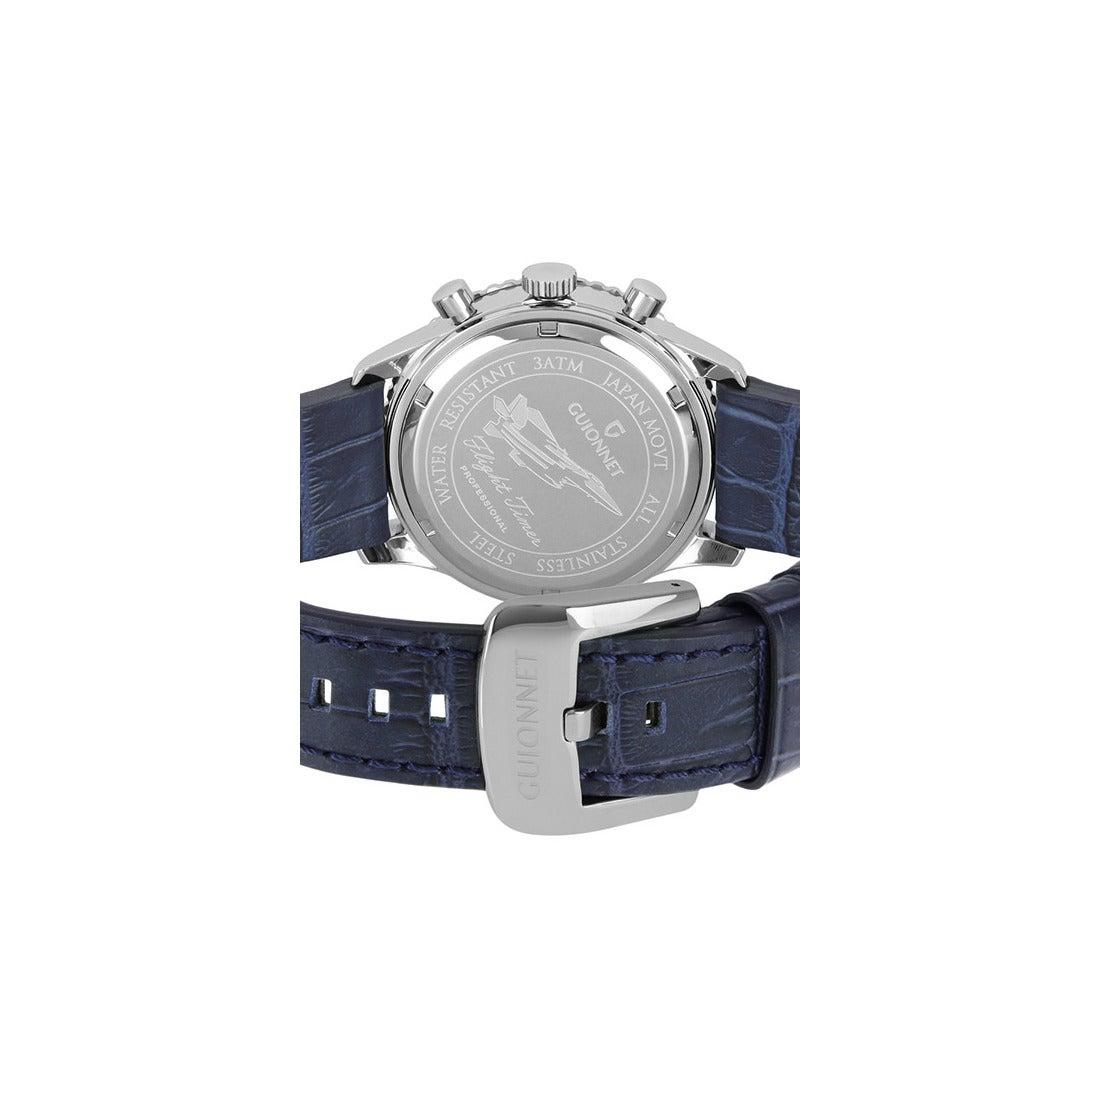 b14bcbb415 GUIONNET GUIONNET Flight Timer Professional 腕時計 FT44SSV メンズ ...